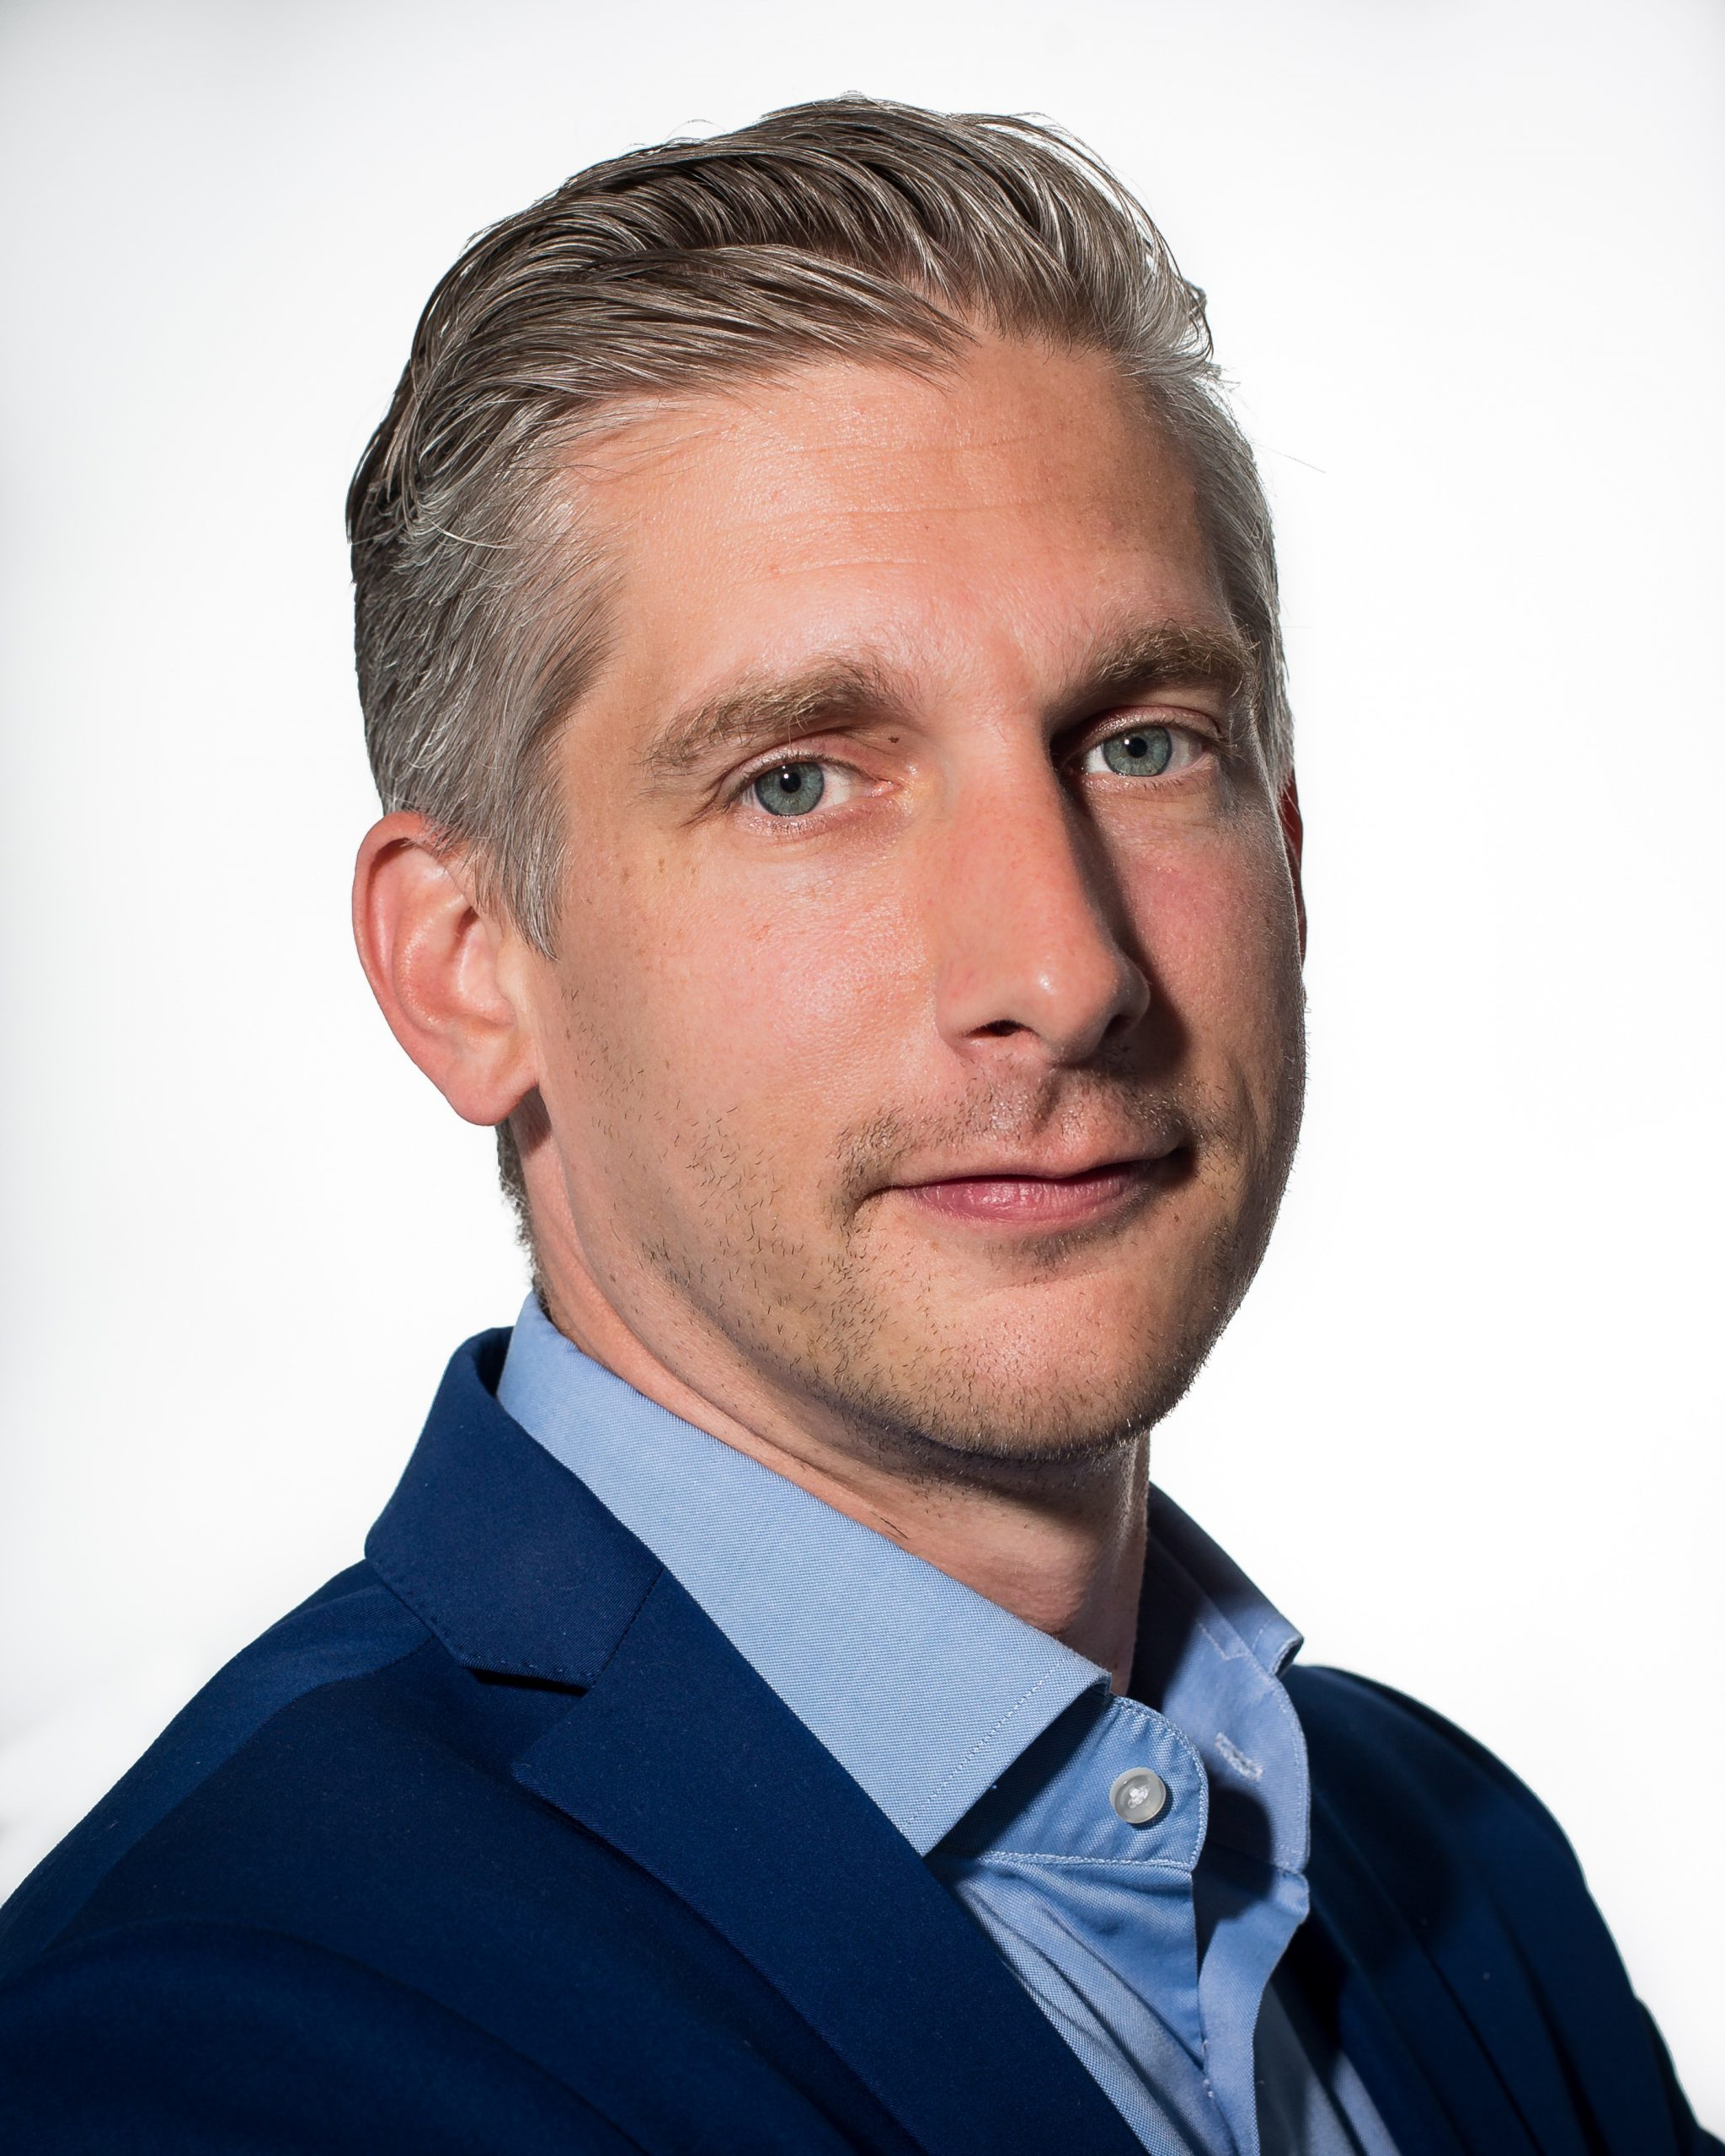 Clouddistributeur Uniserver neemt branchegenoot Denit over